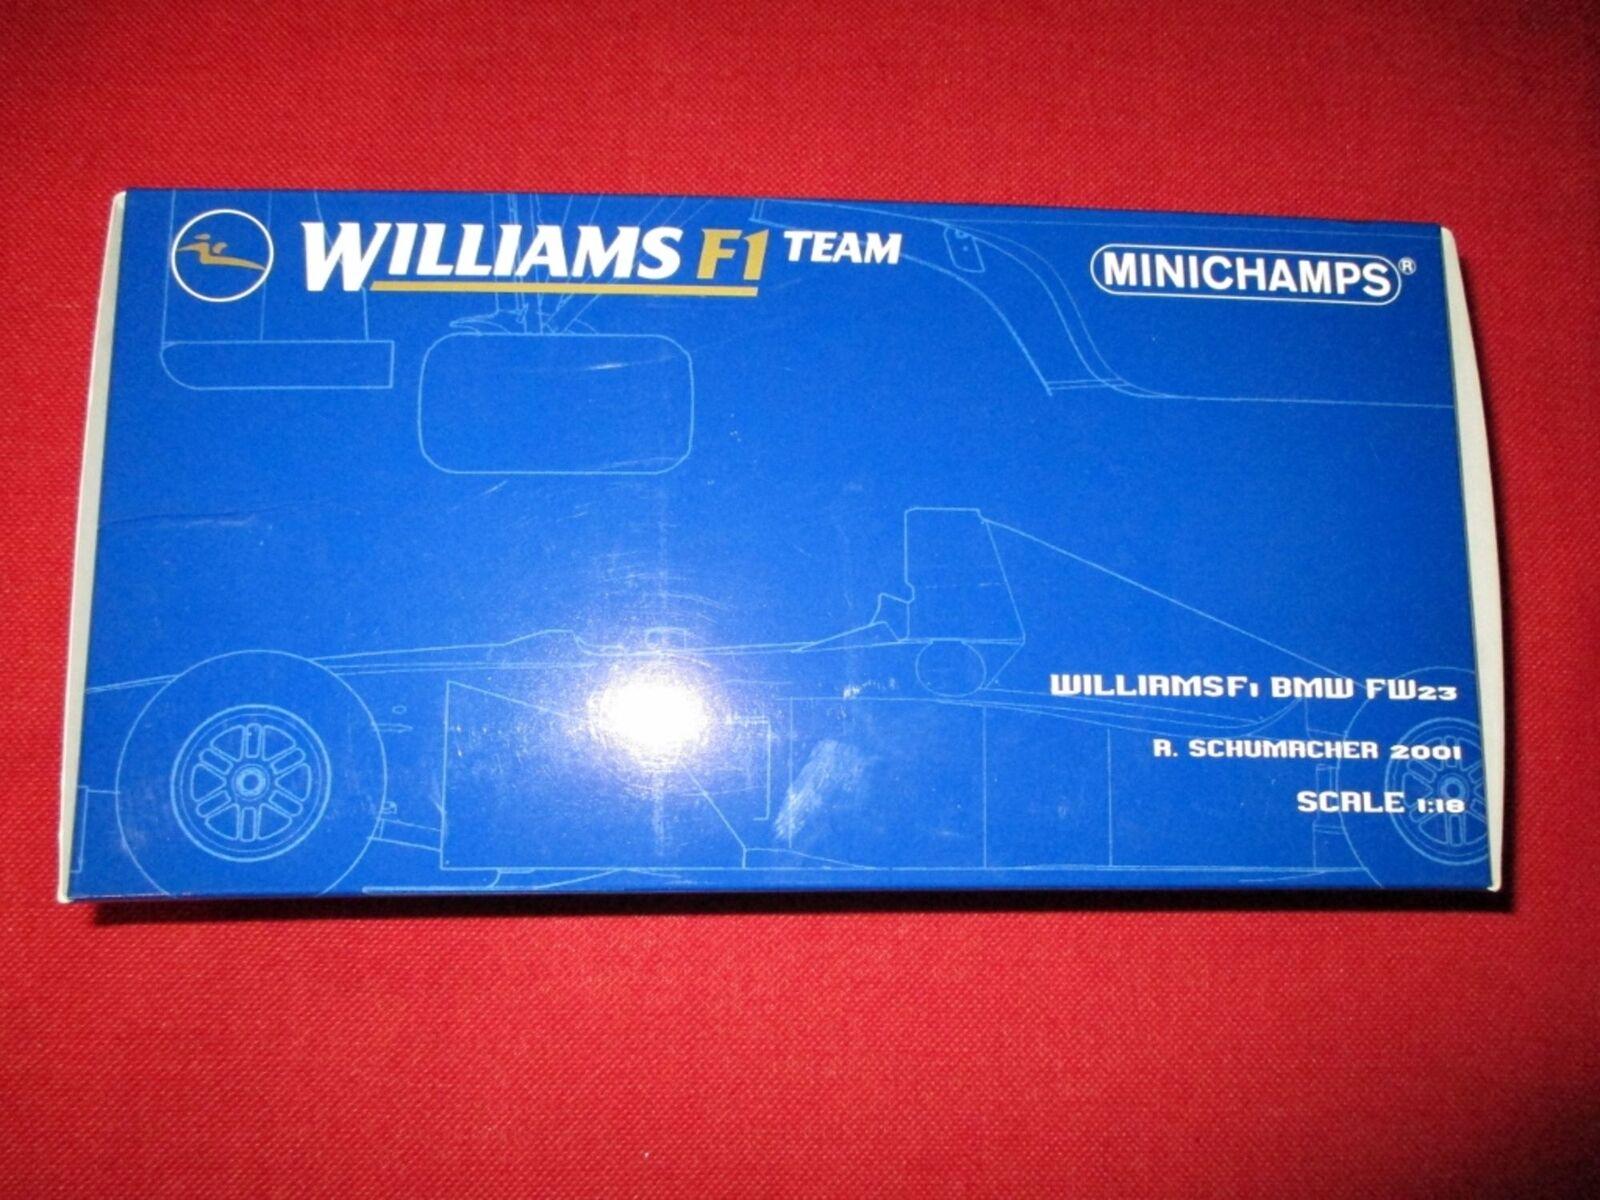 MINICHAMPS ® 100 010005 1 18 Williamsf 1 Bmw fw23 R. Schumacher 2001 Nouveau neuf dans sa boîte